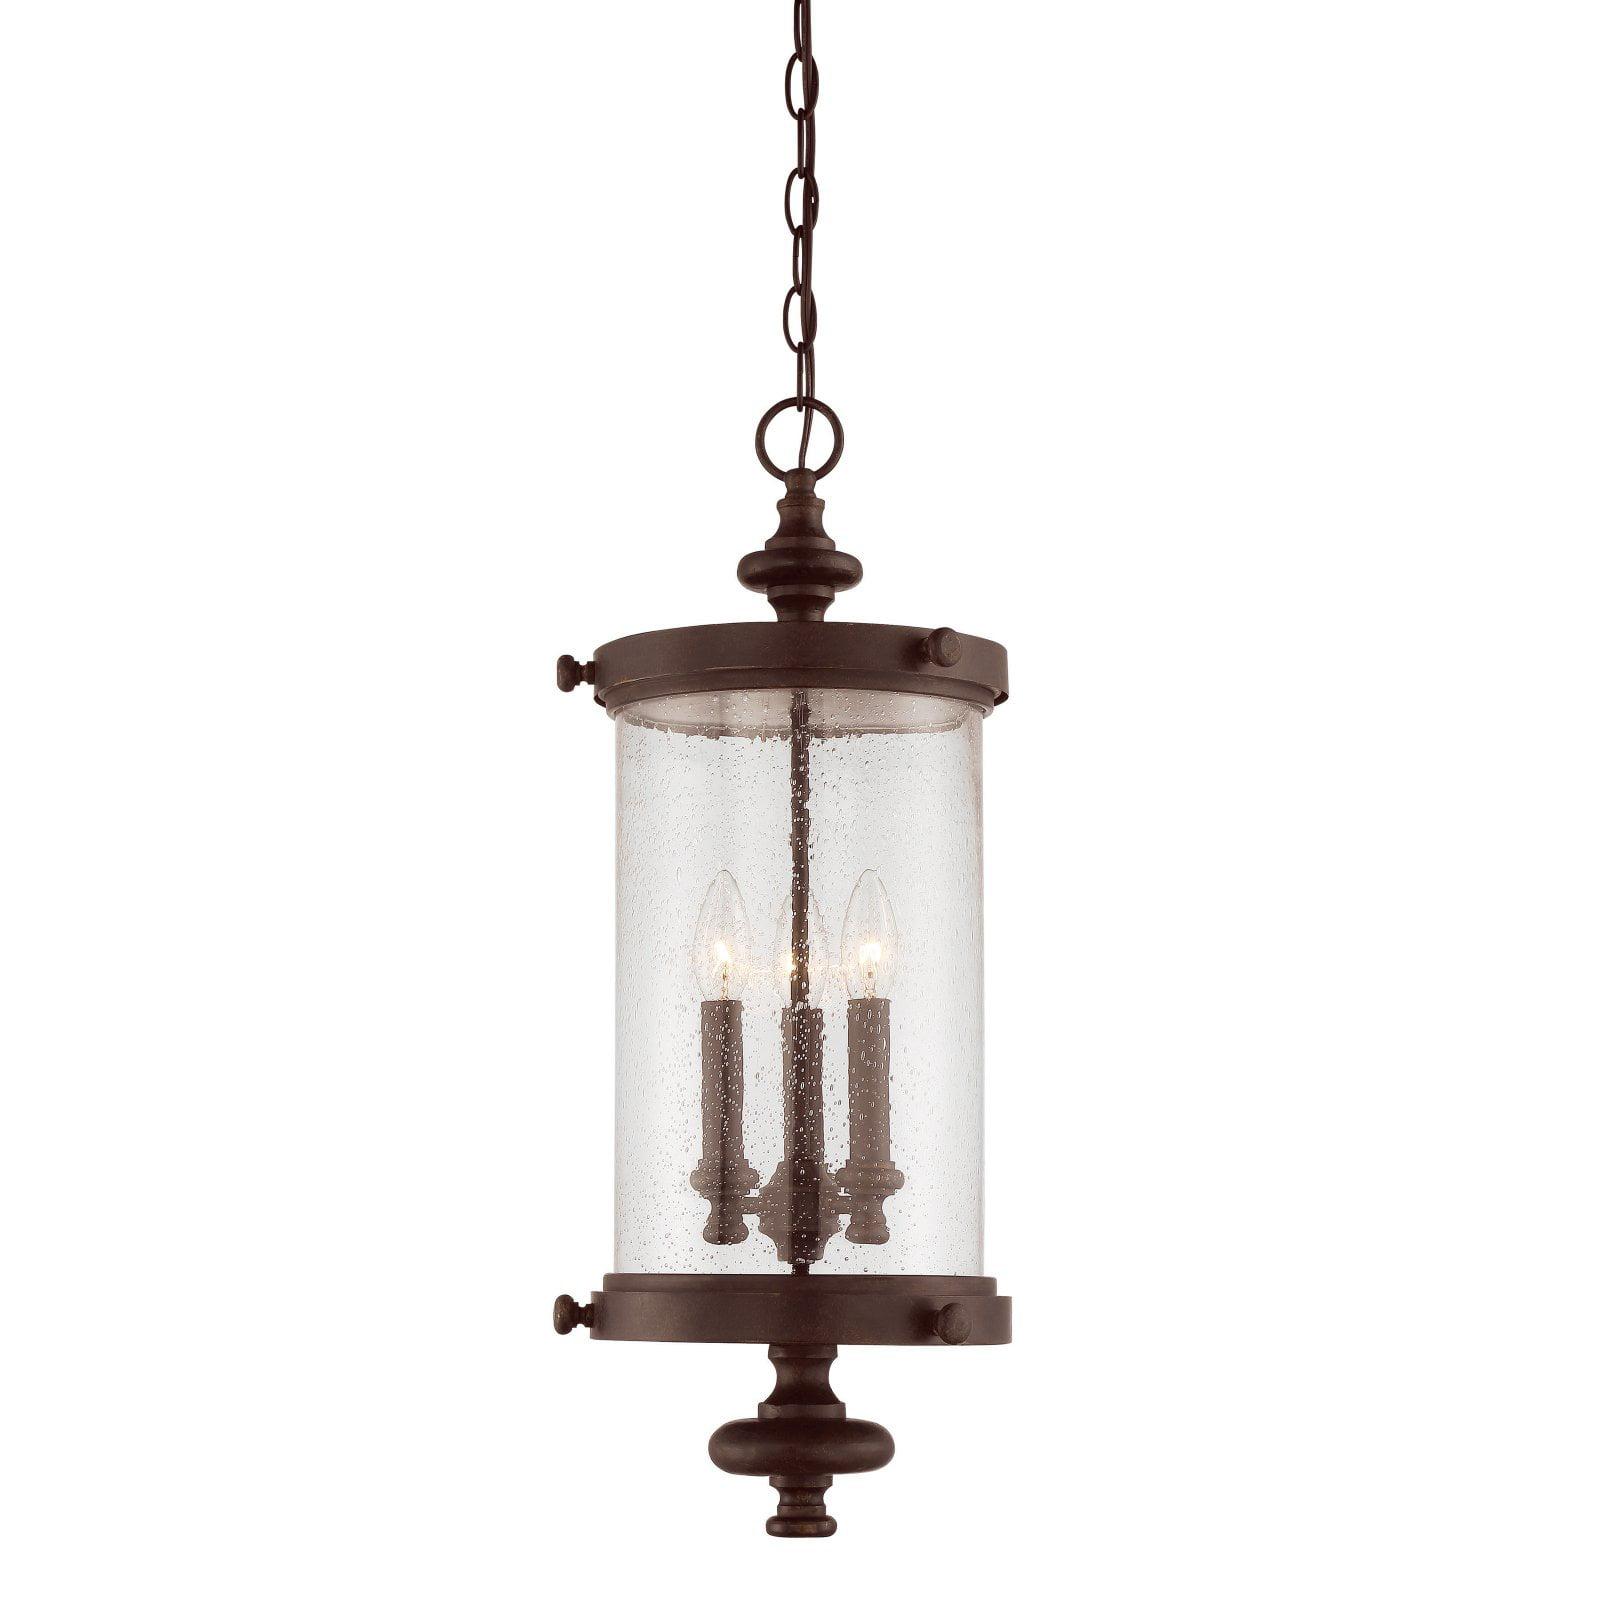 Savoy House Palmer 5-1222-40 Outdoor Hanging Lantern by Savoy House